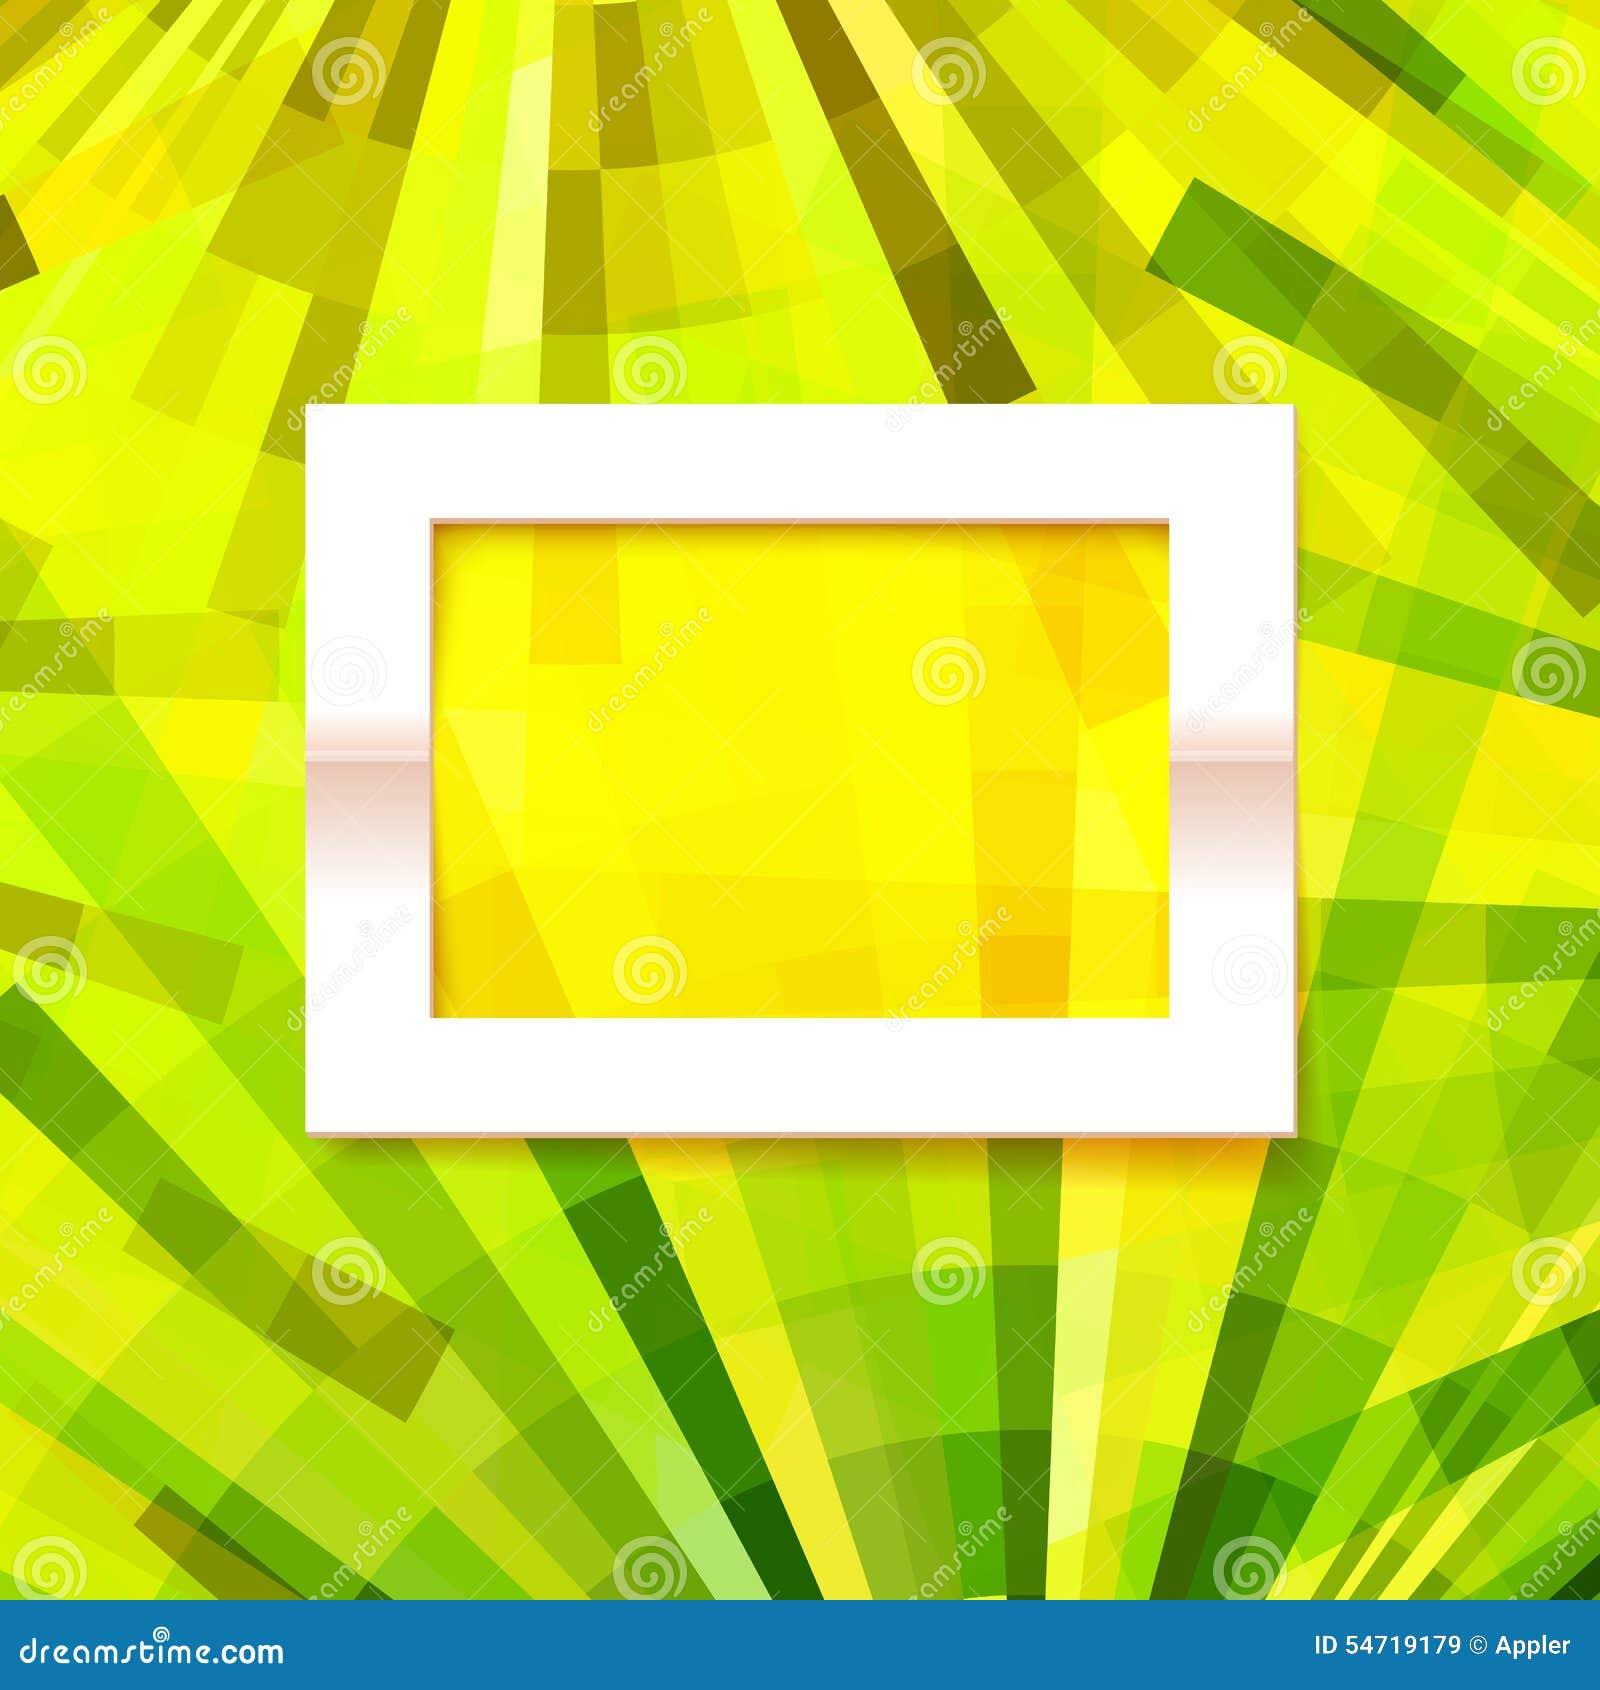 geometric yellow background illustration - photo #26